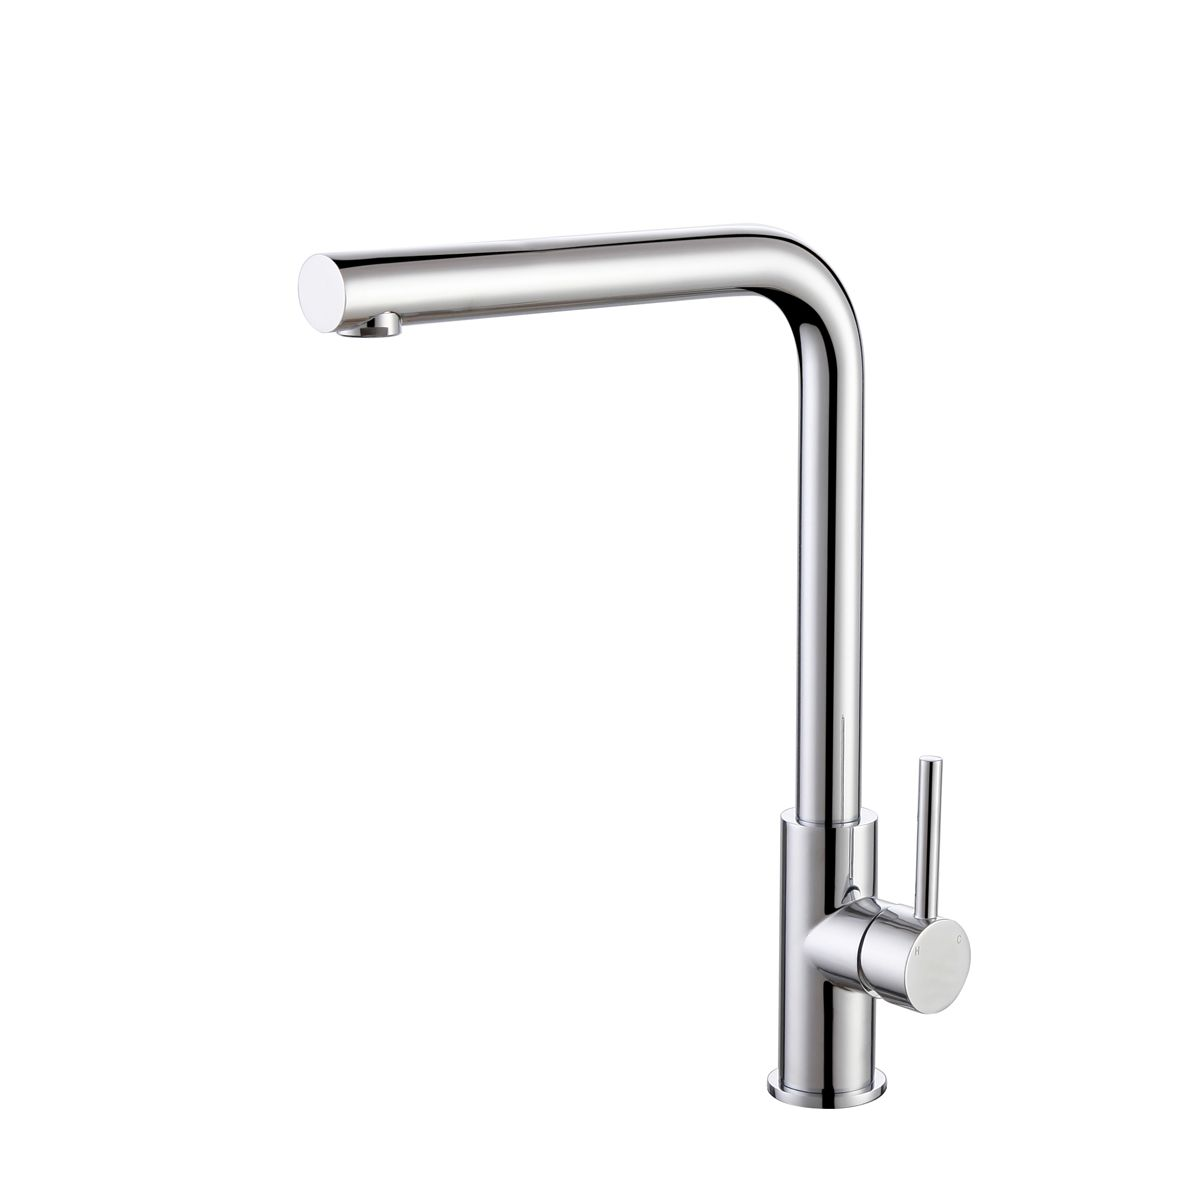 RAK Munich Chrome Side Lever Handle Kitchen Sink Mixer Tap